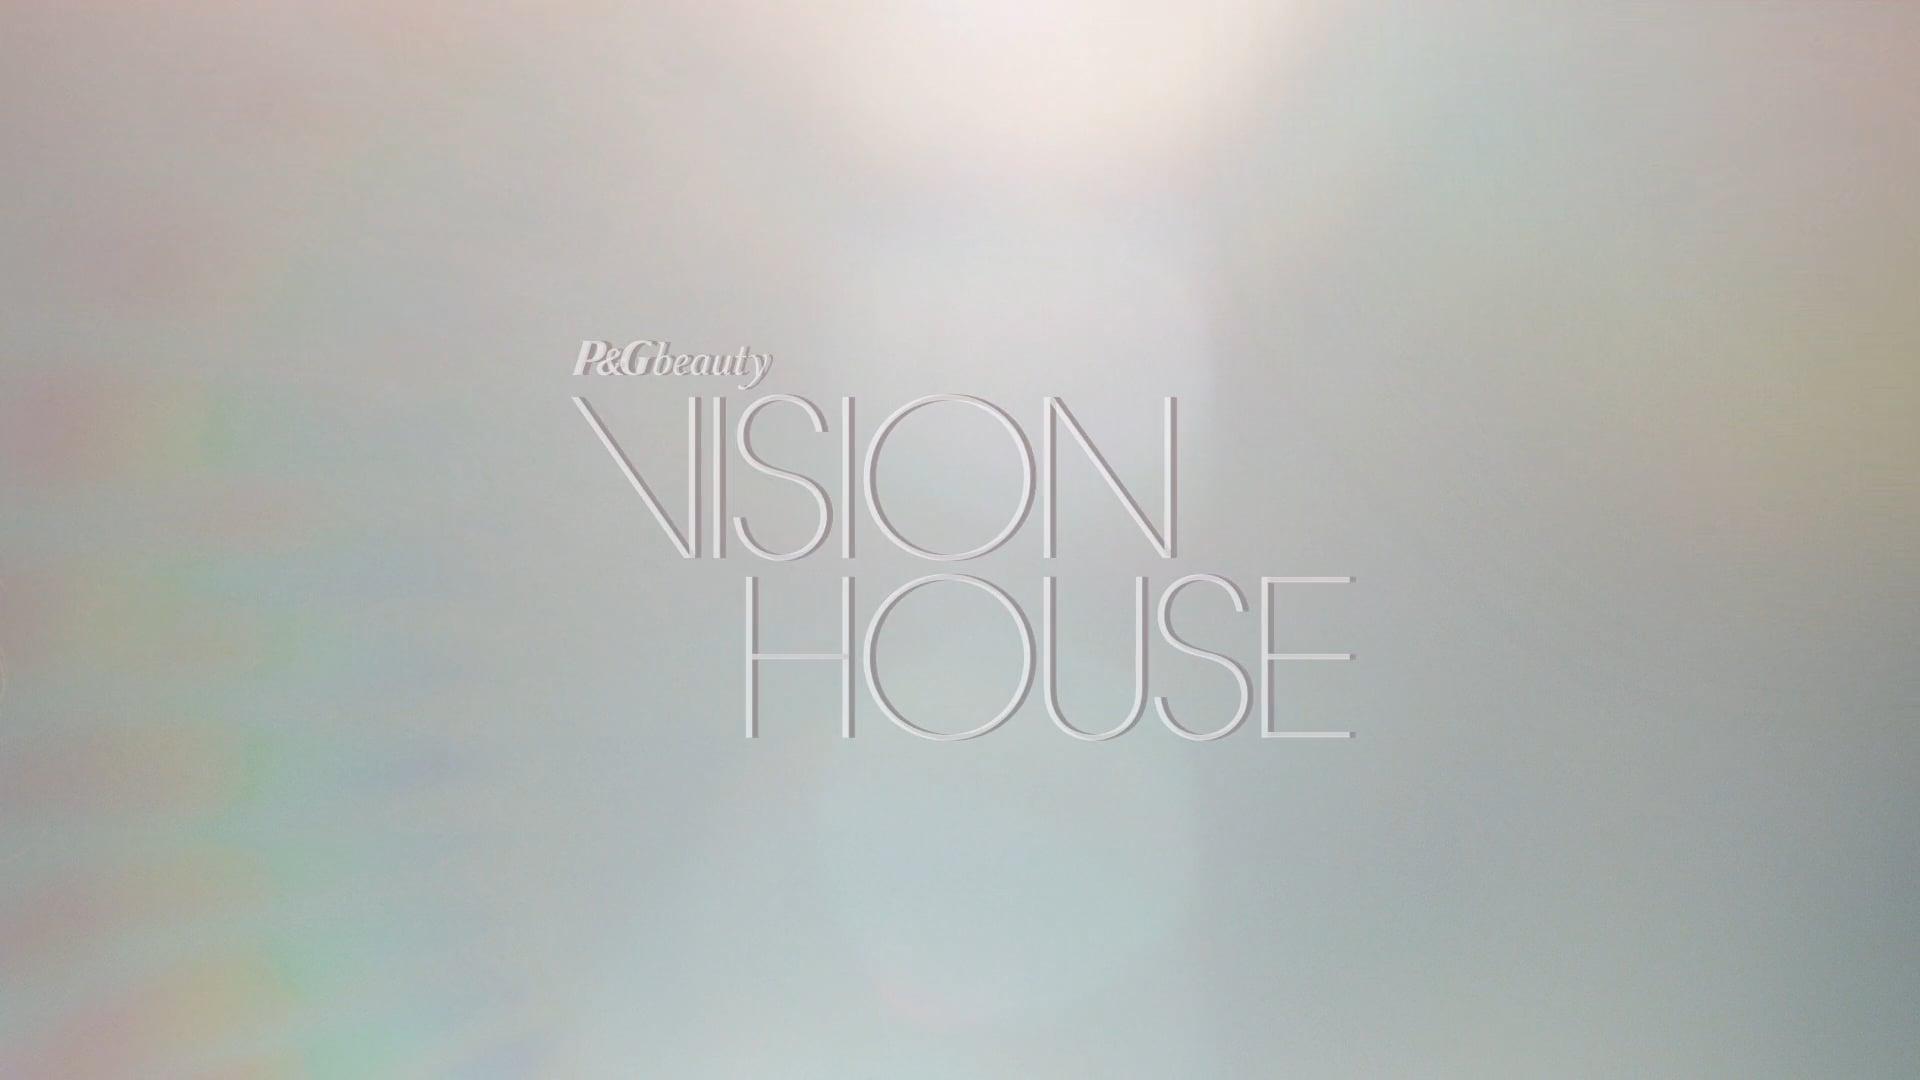 P&G Vision House